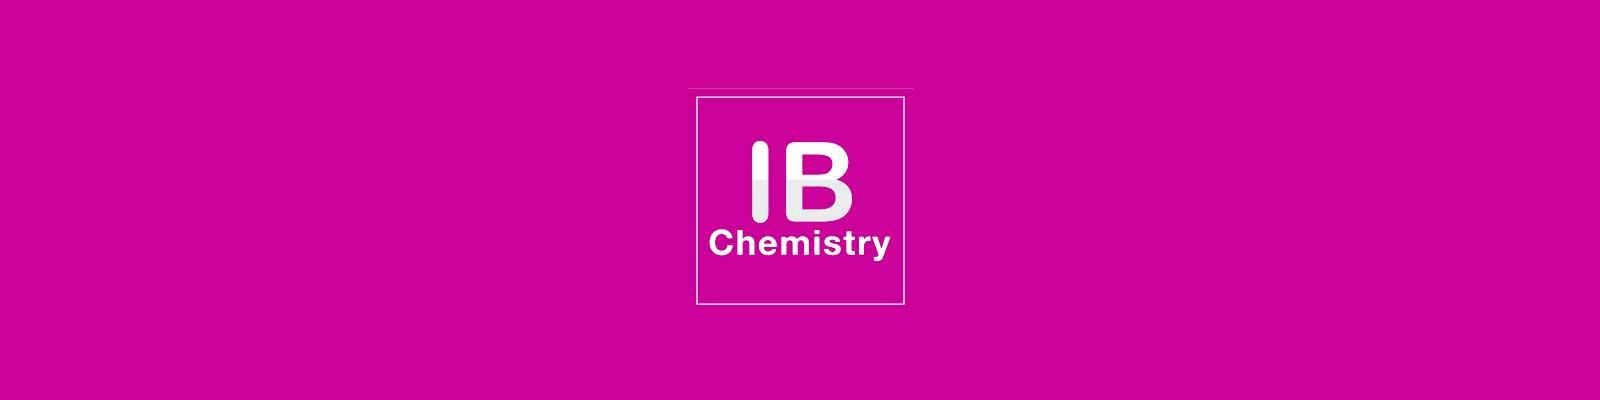 IB-chemistry